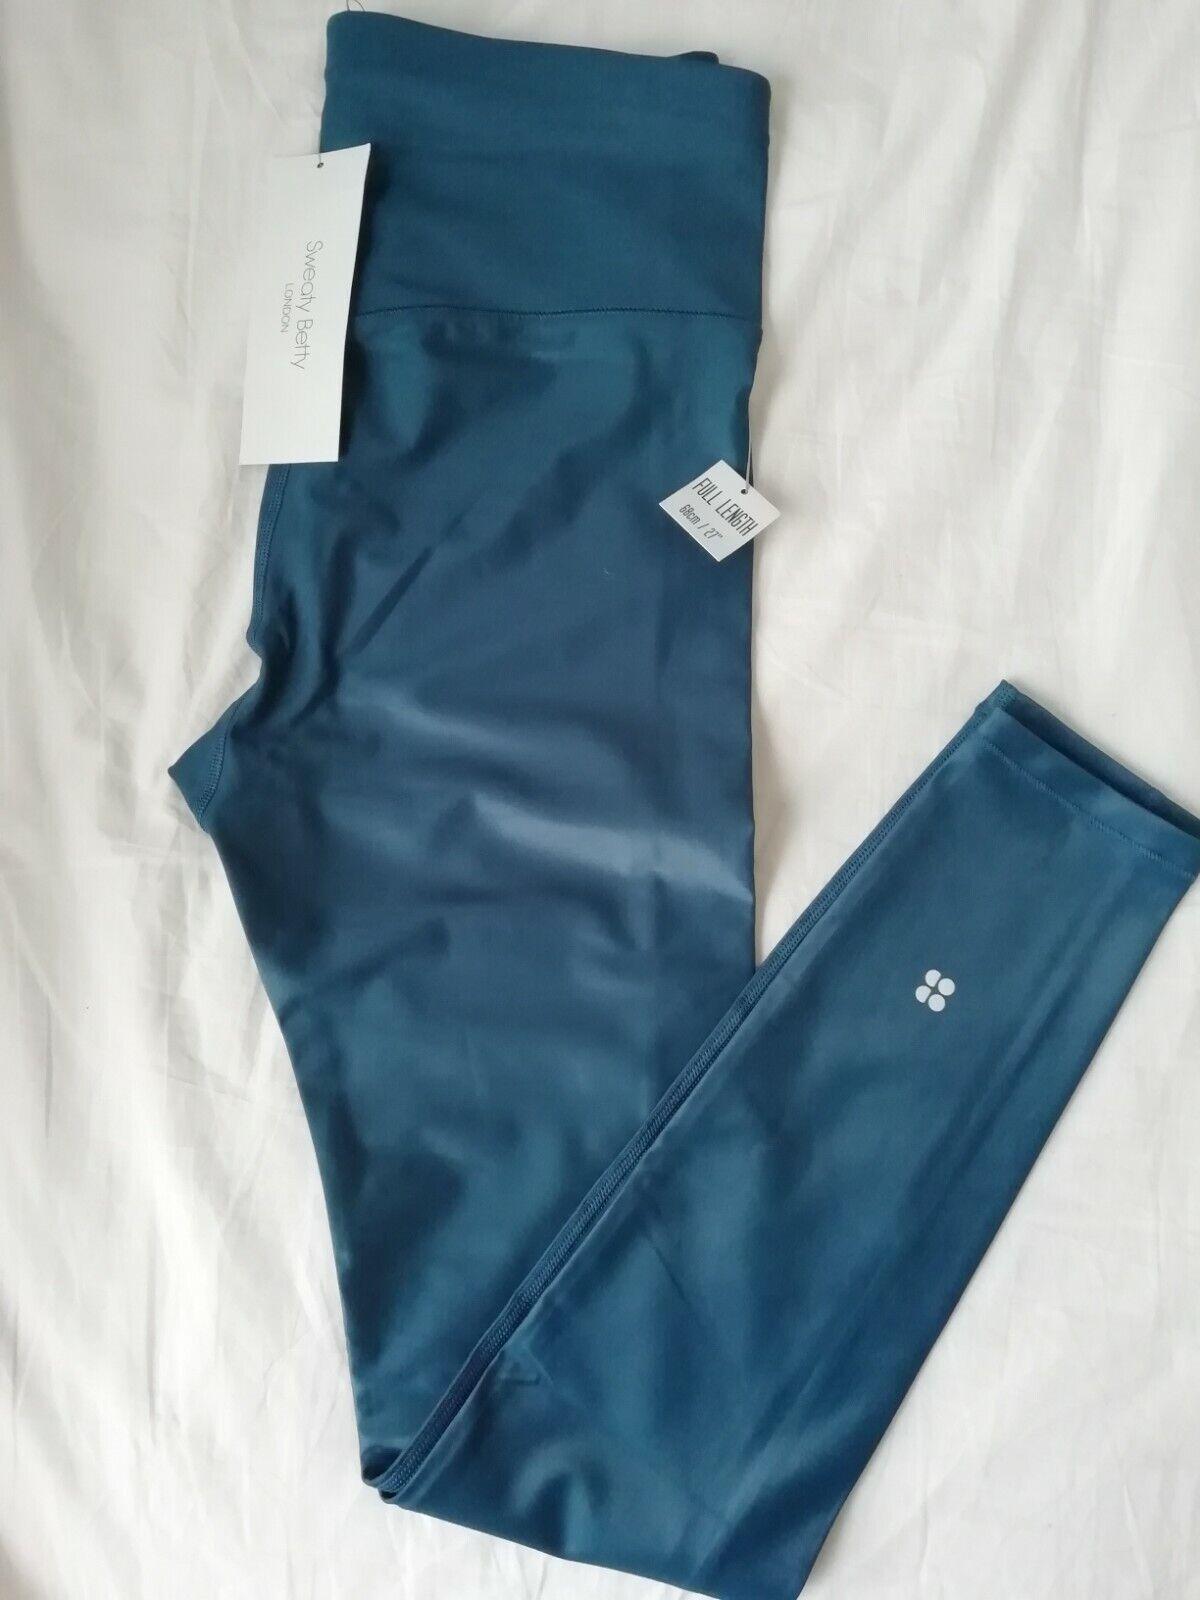 BNWT Sweaty Betty High Shine Gym Leggings Large (L), High waisted Blue YOGA